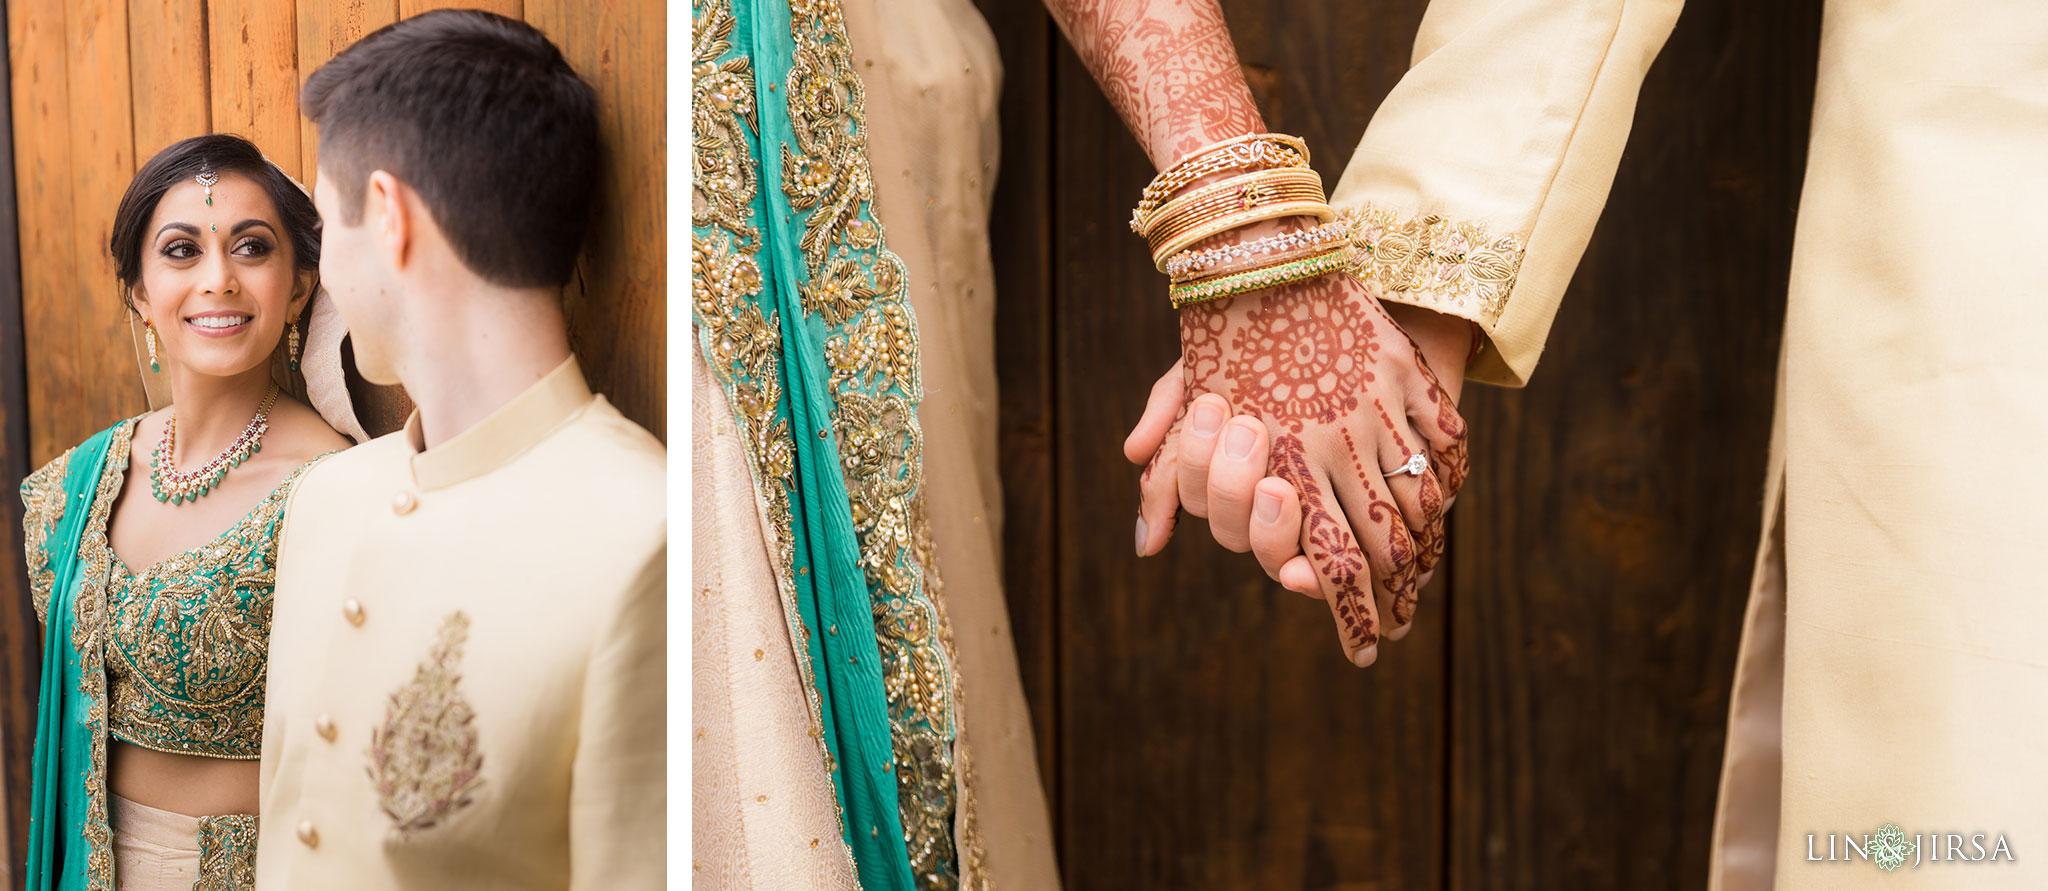 14 pasea hotel and spa huntington beach indian wedding photography